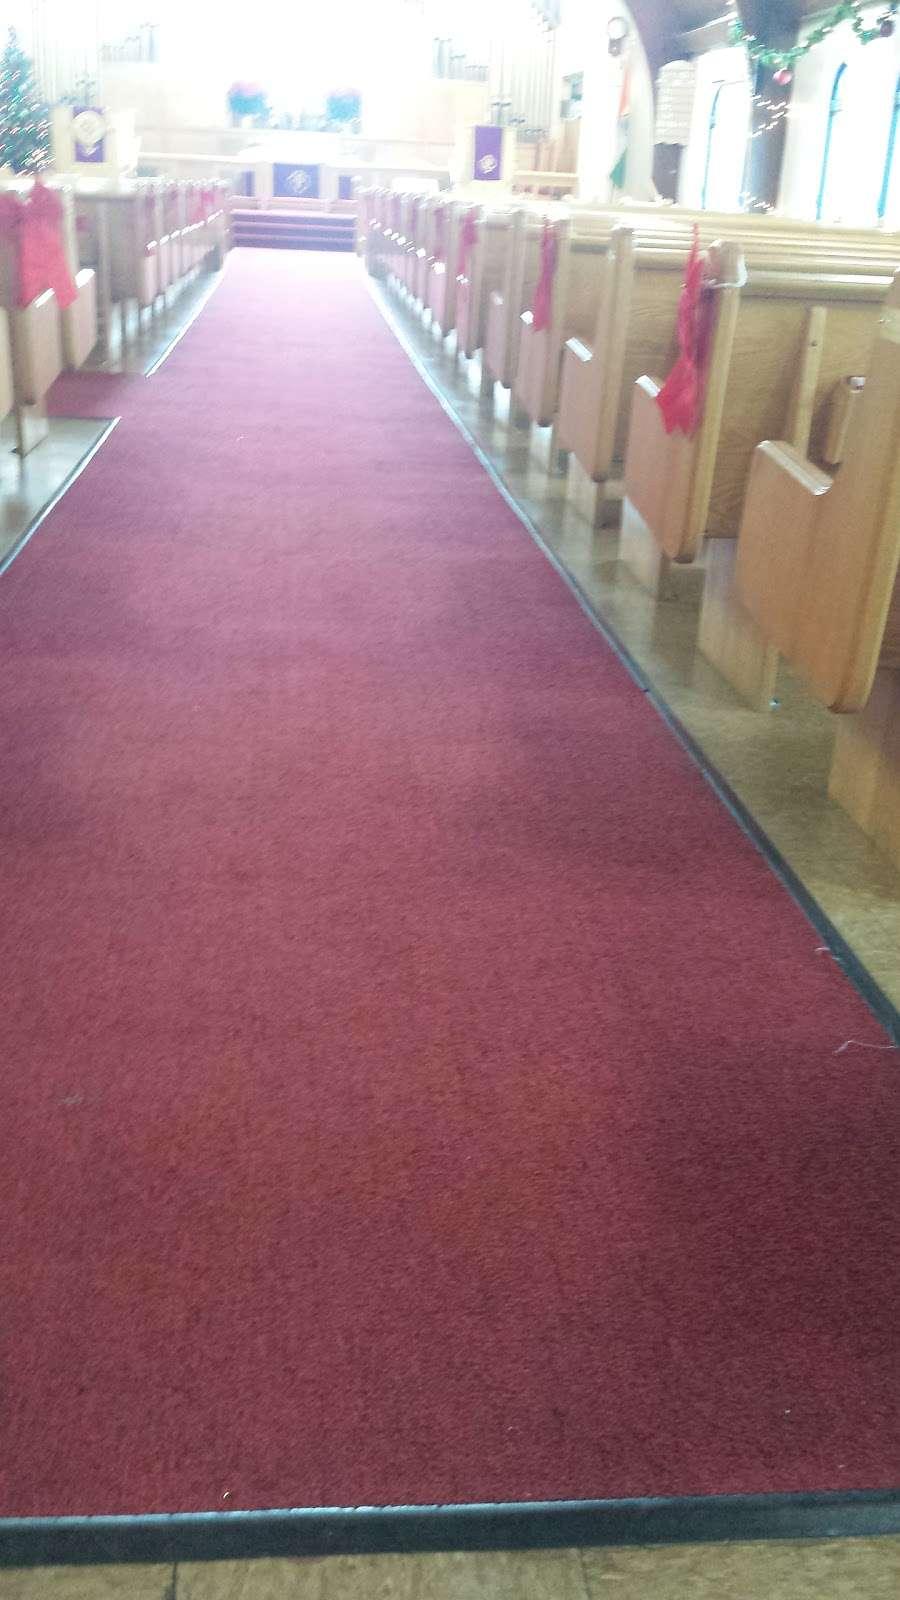 Church of South India Malayalam Congregation of Greater New York - church  | Photo 4 of 4 | Address: 3833 Jerusalem Ave, Seaford, NY 11783, USA | Phone: (516) 342-9879